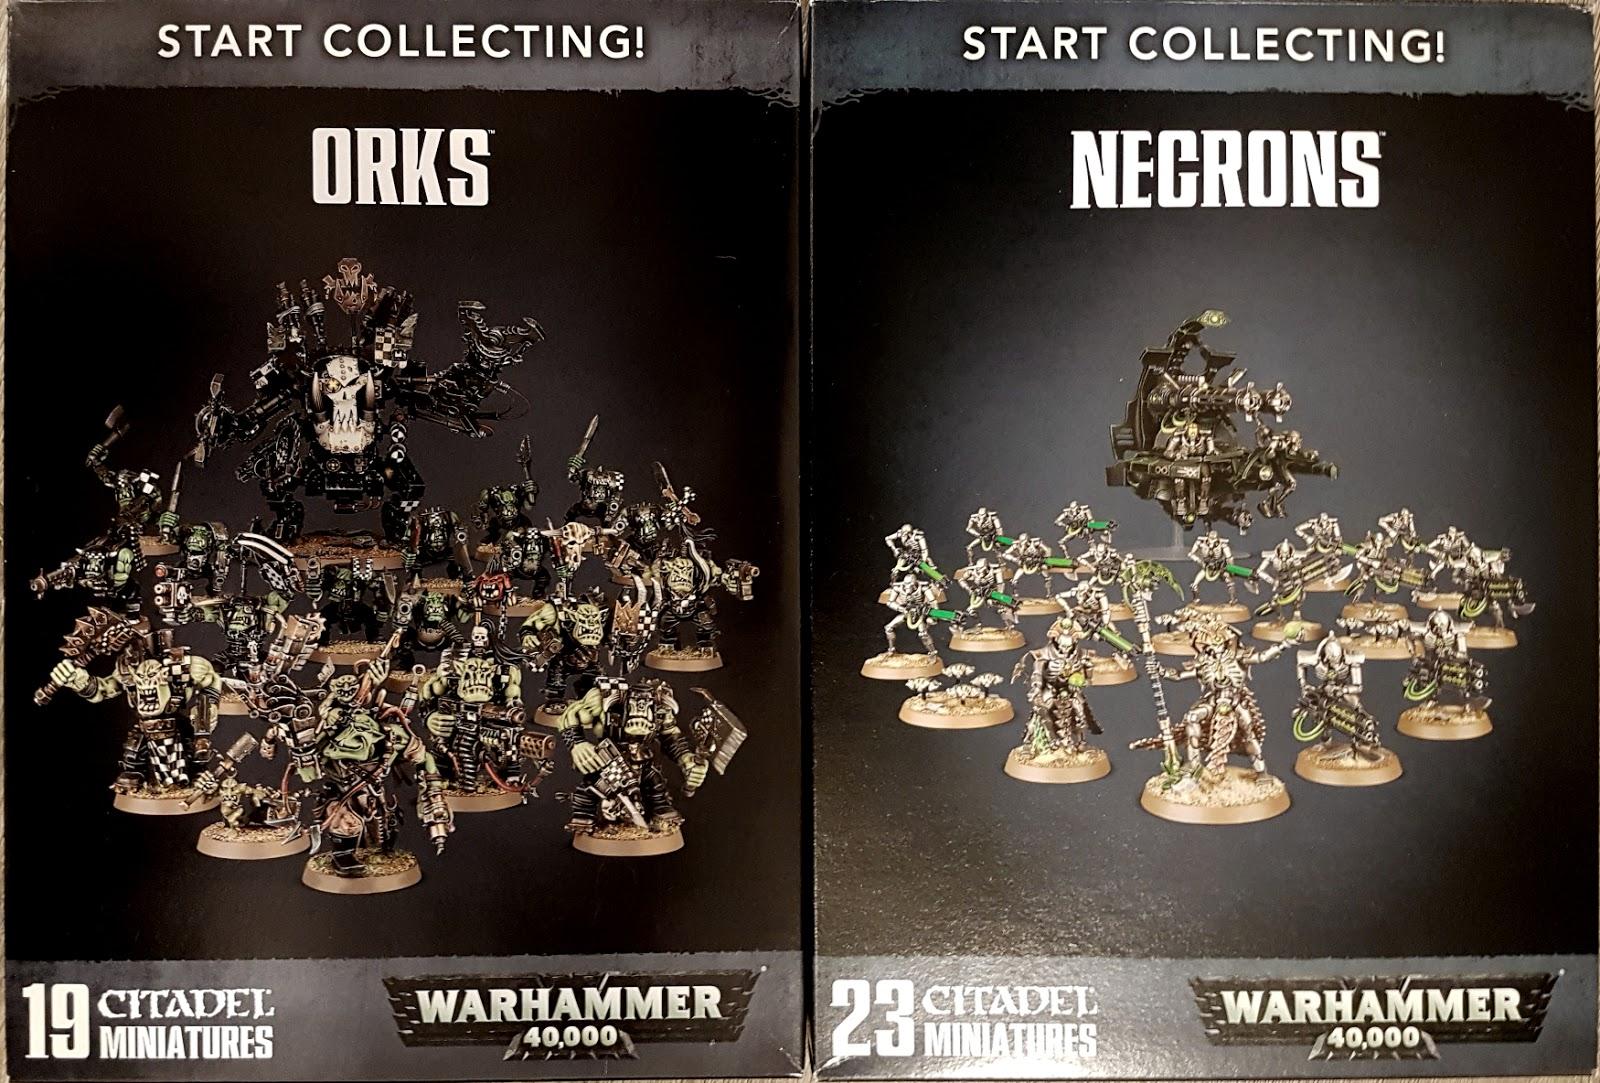 JADE's Two New Warhammer 40k Armies (Finally!) - Jade Gaming